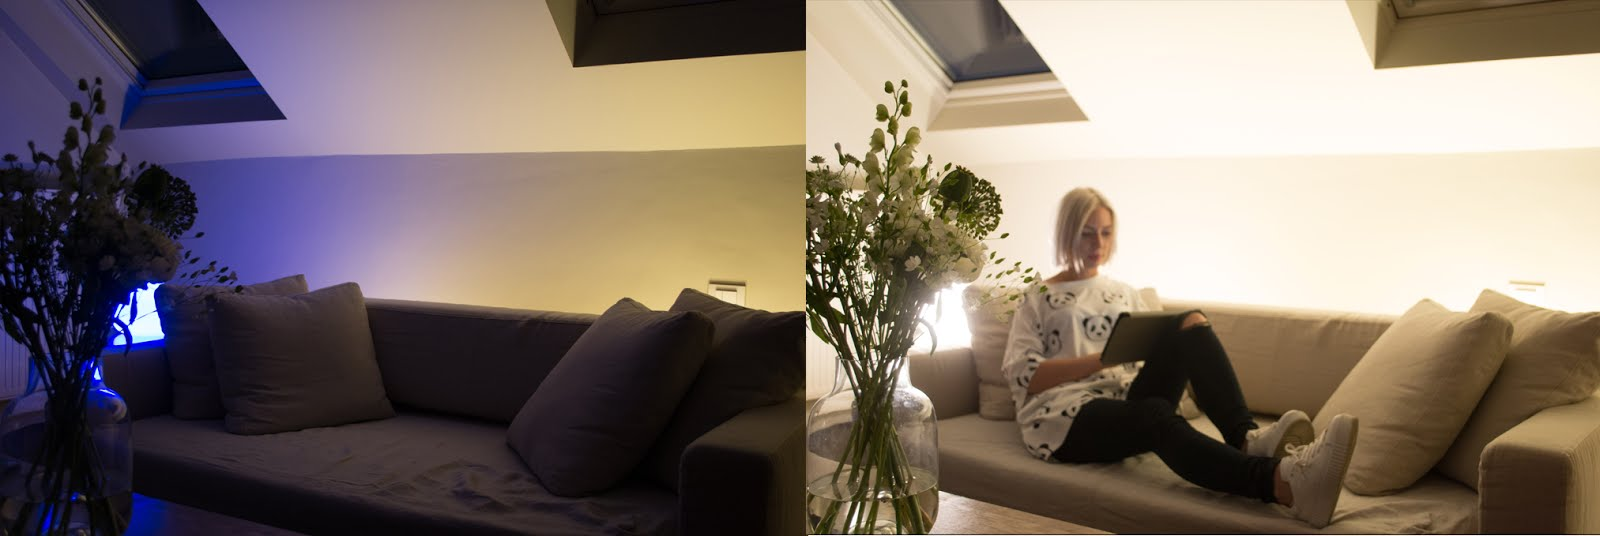 Philips hue, wireless light, wellbeing, event, hotel julien antwerp